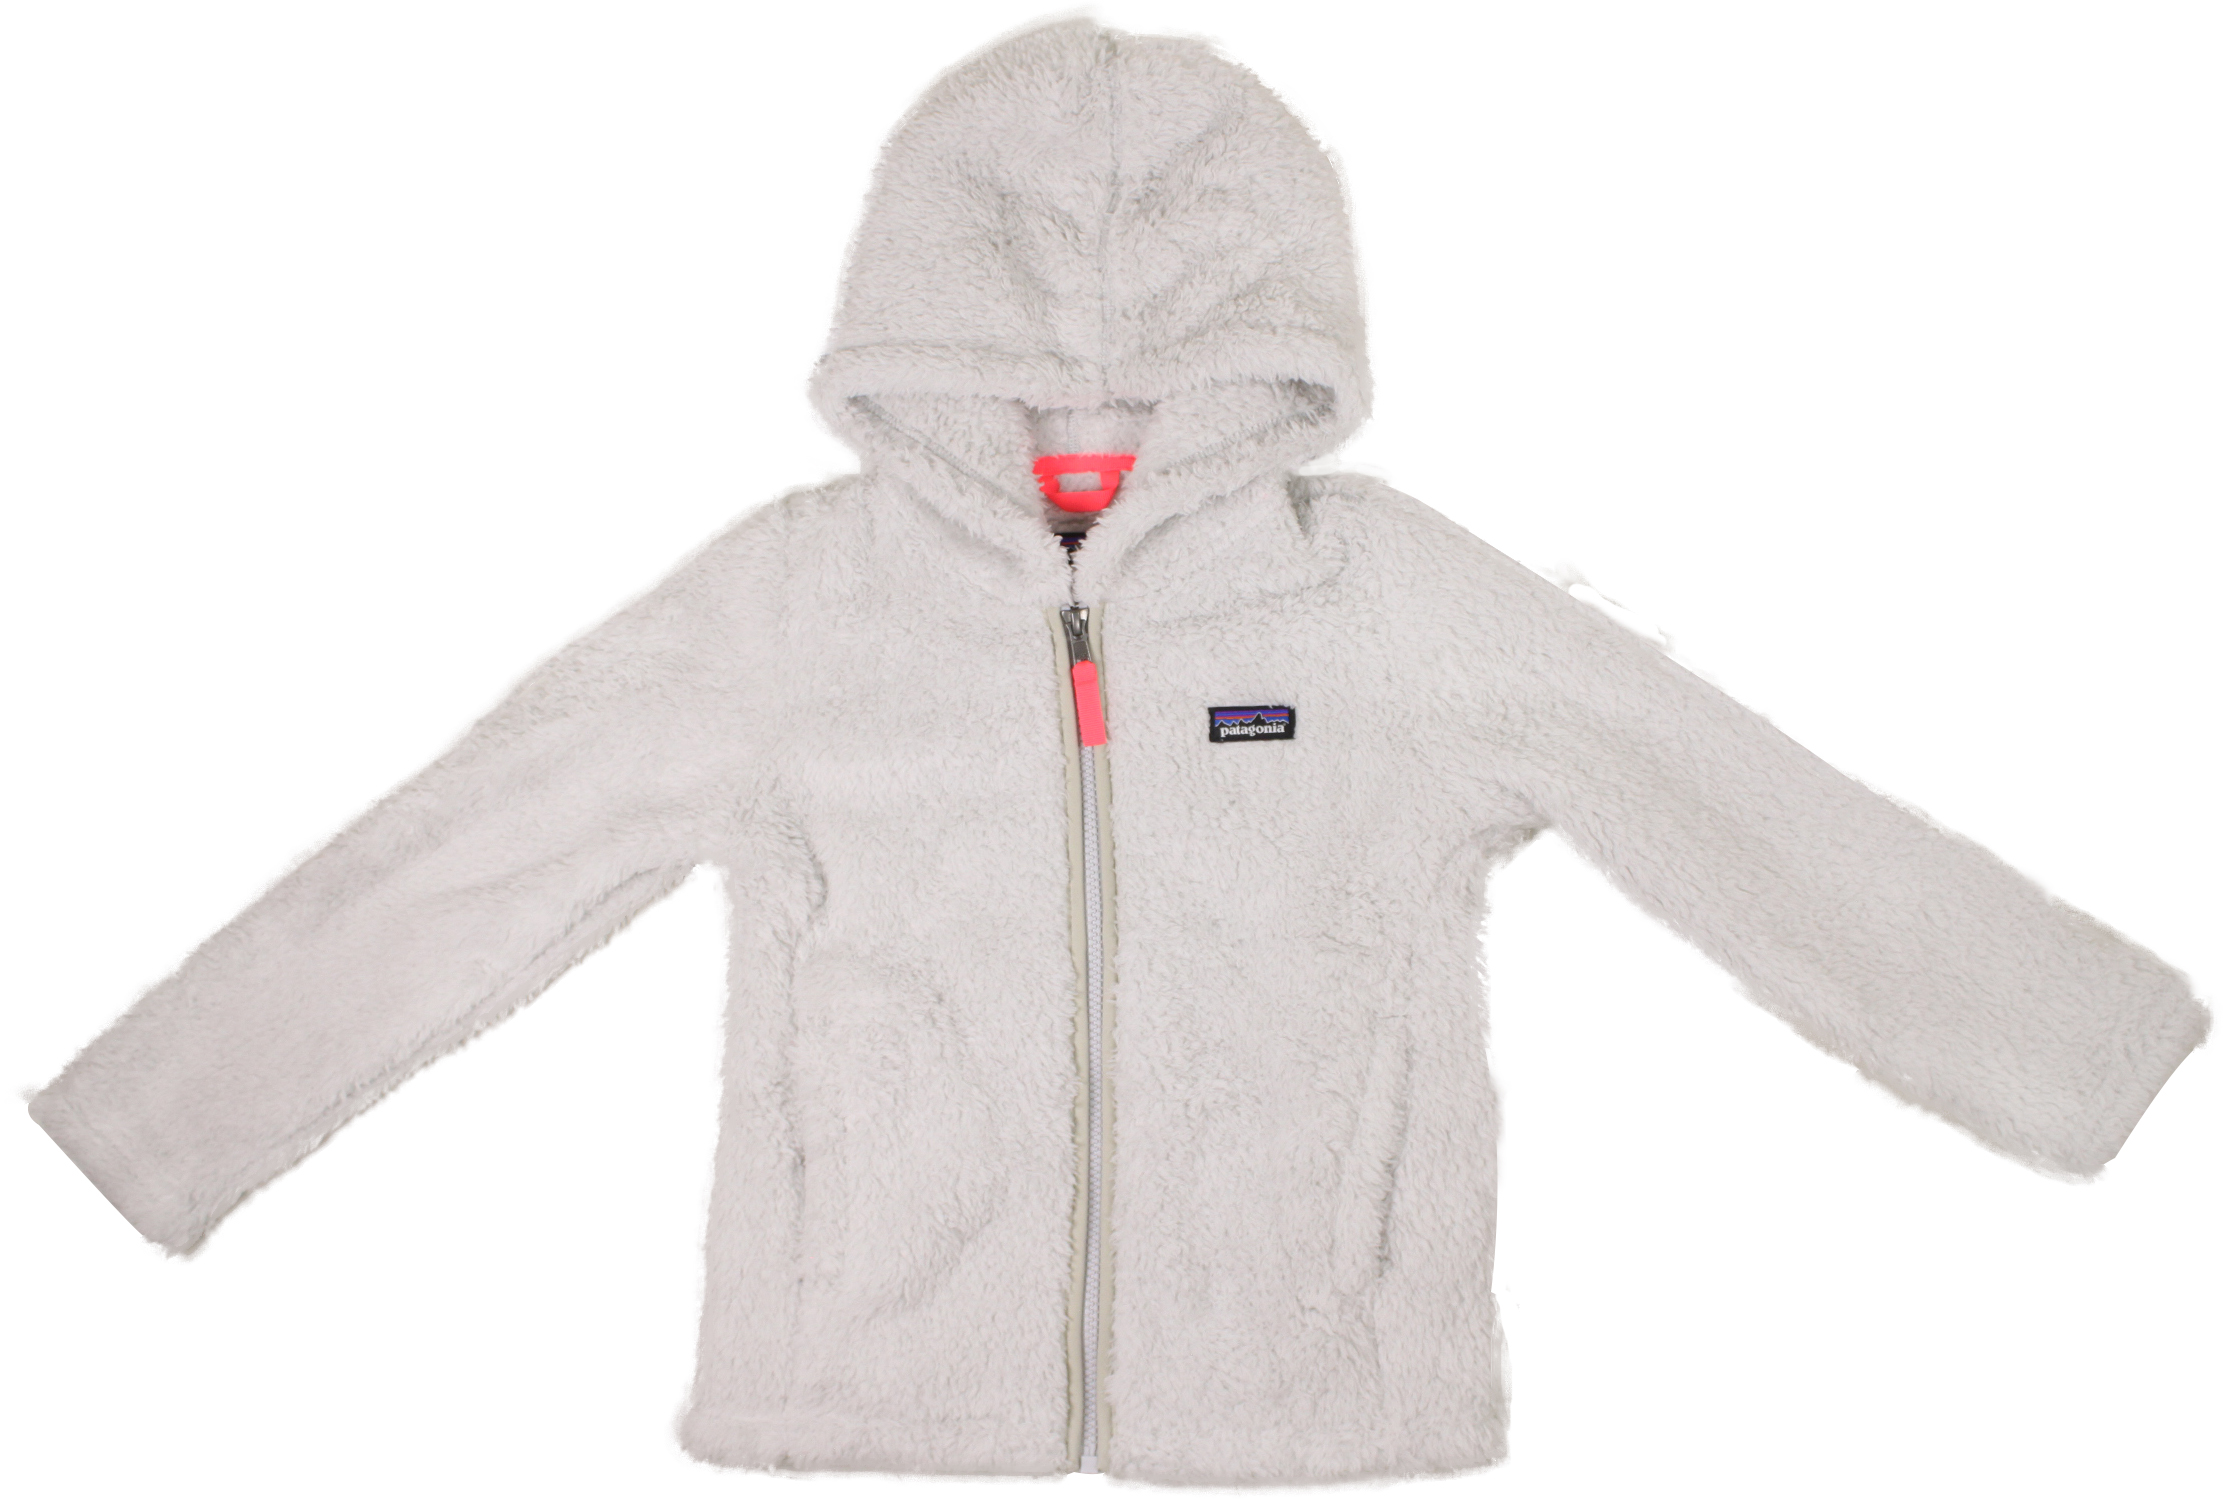 7d079da2b8d72 Clothing · Kids · Girls (8-16) · Jackets   Vests · G s Los Gatos - Tailored  Grey ...